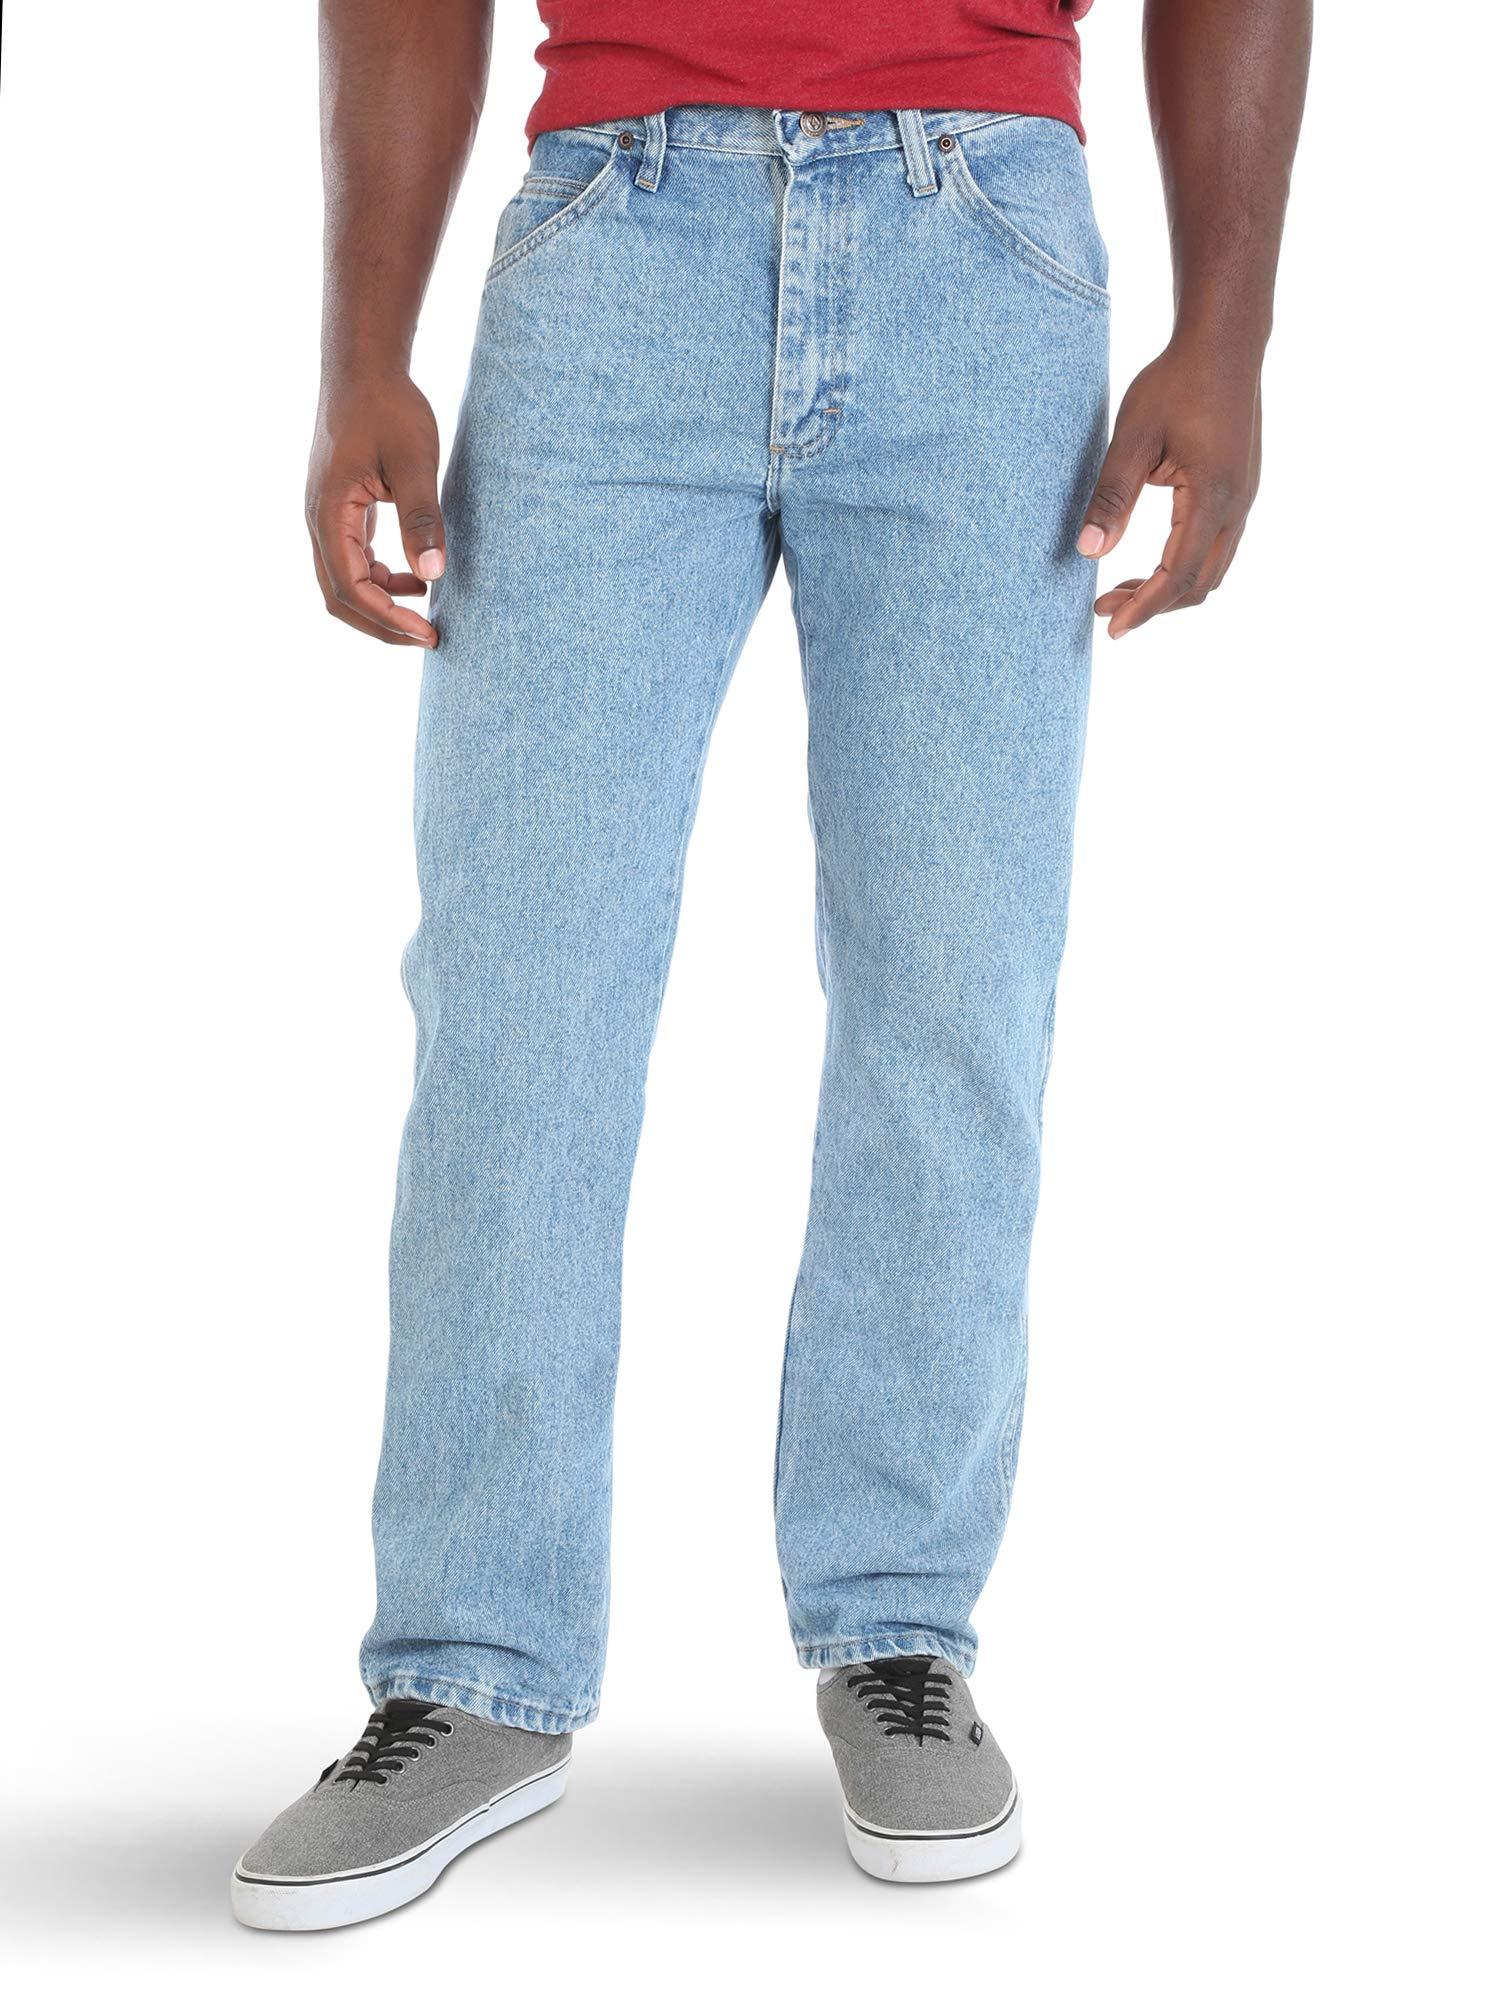 Wrangler Authentics Men's Classic 5-Pocket Regular Fit Jean,Light Stonewash,34x28